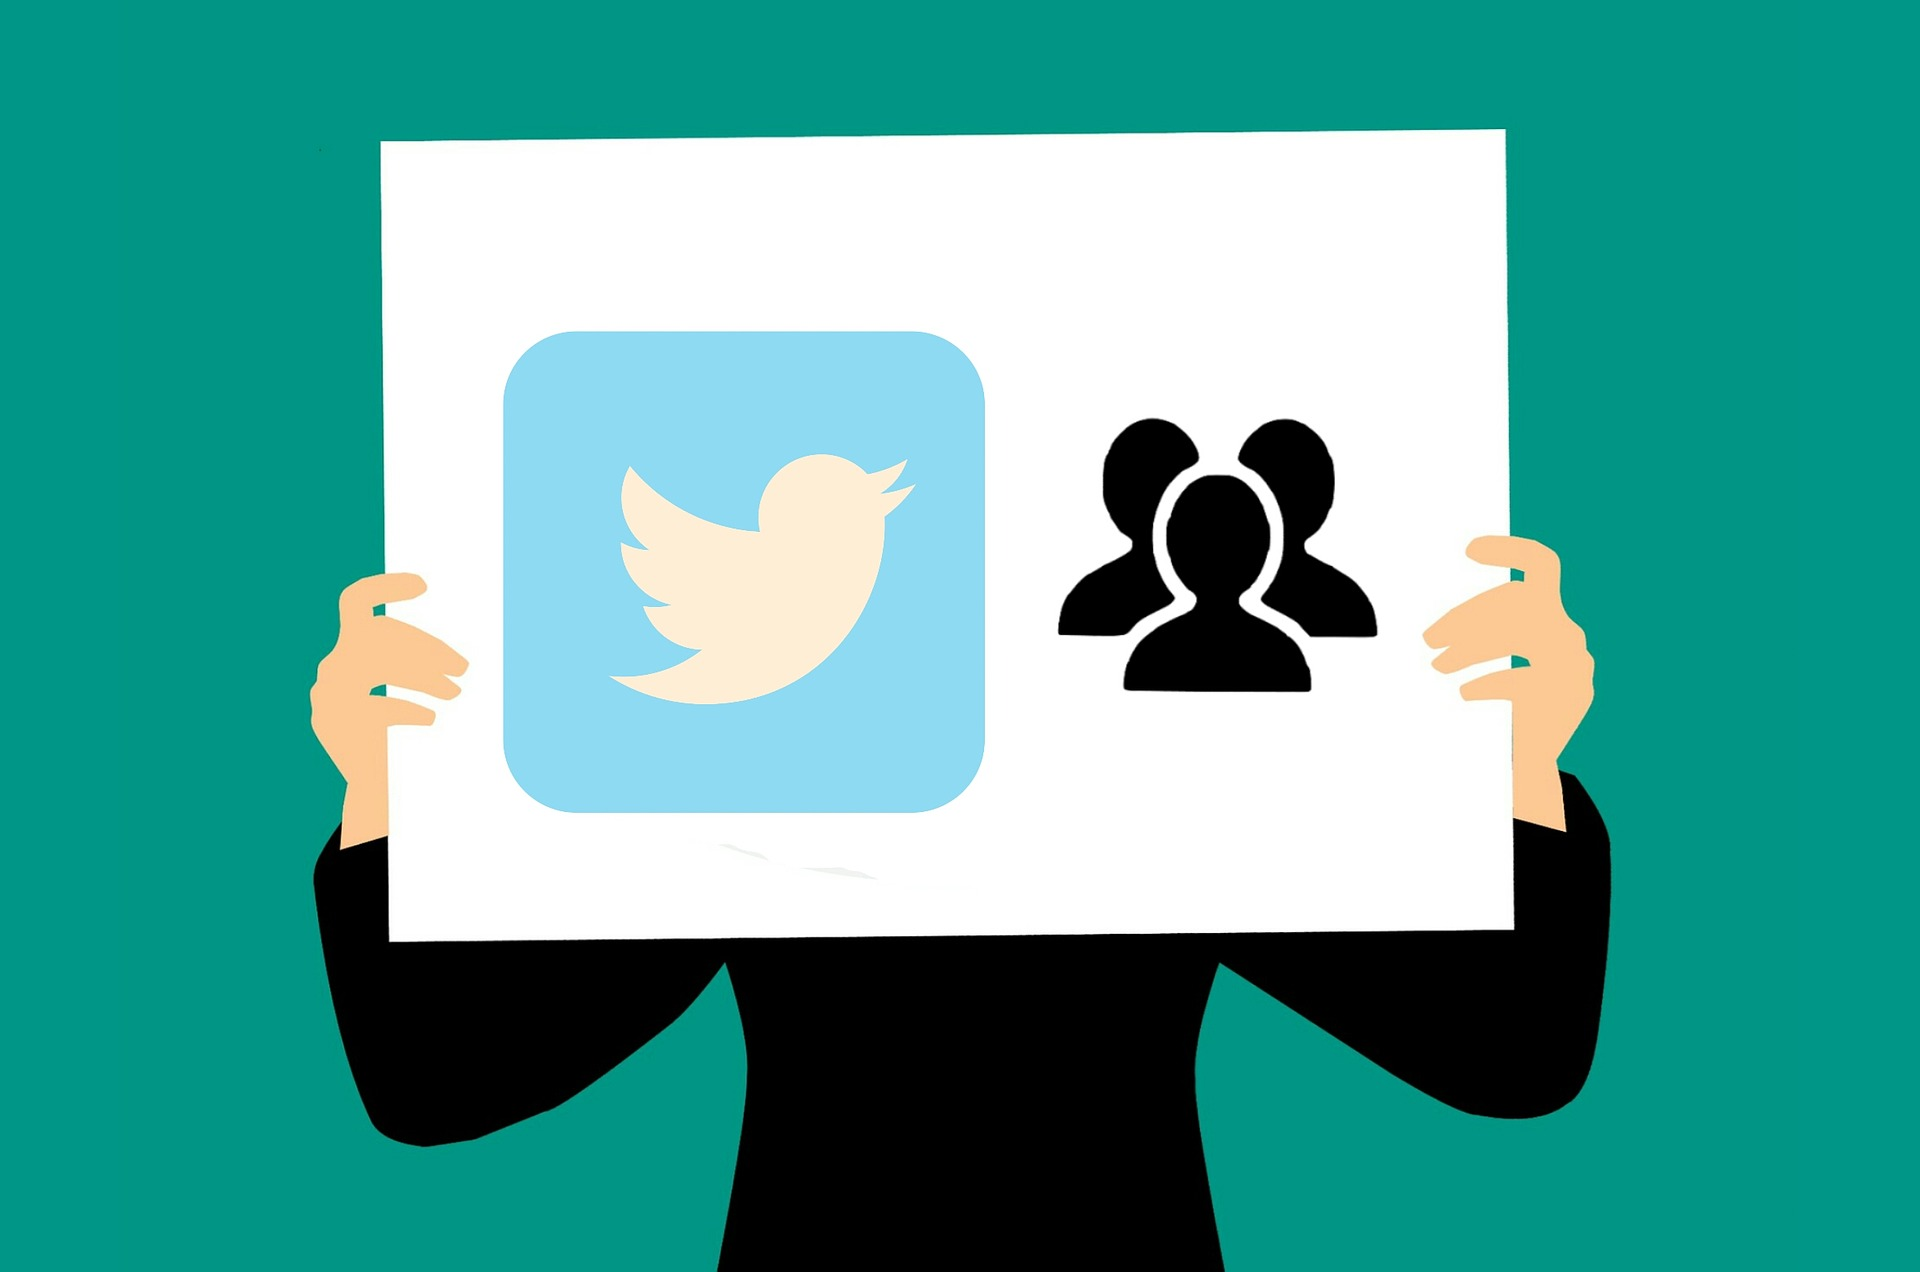 Man holding twitter sign